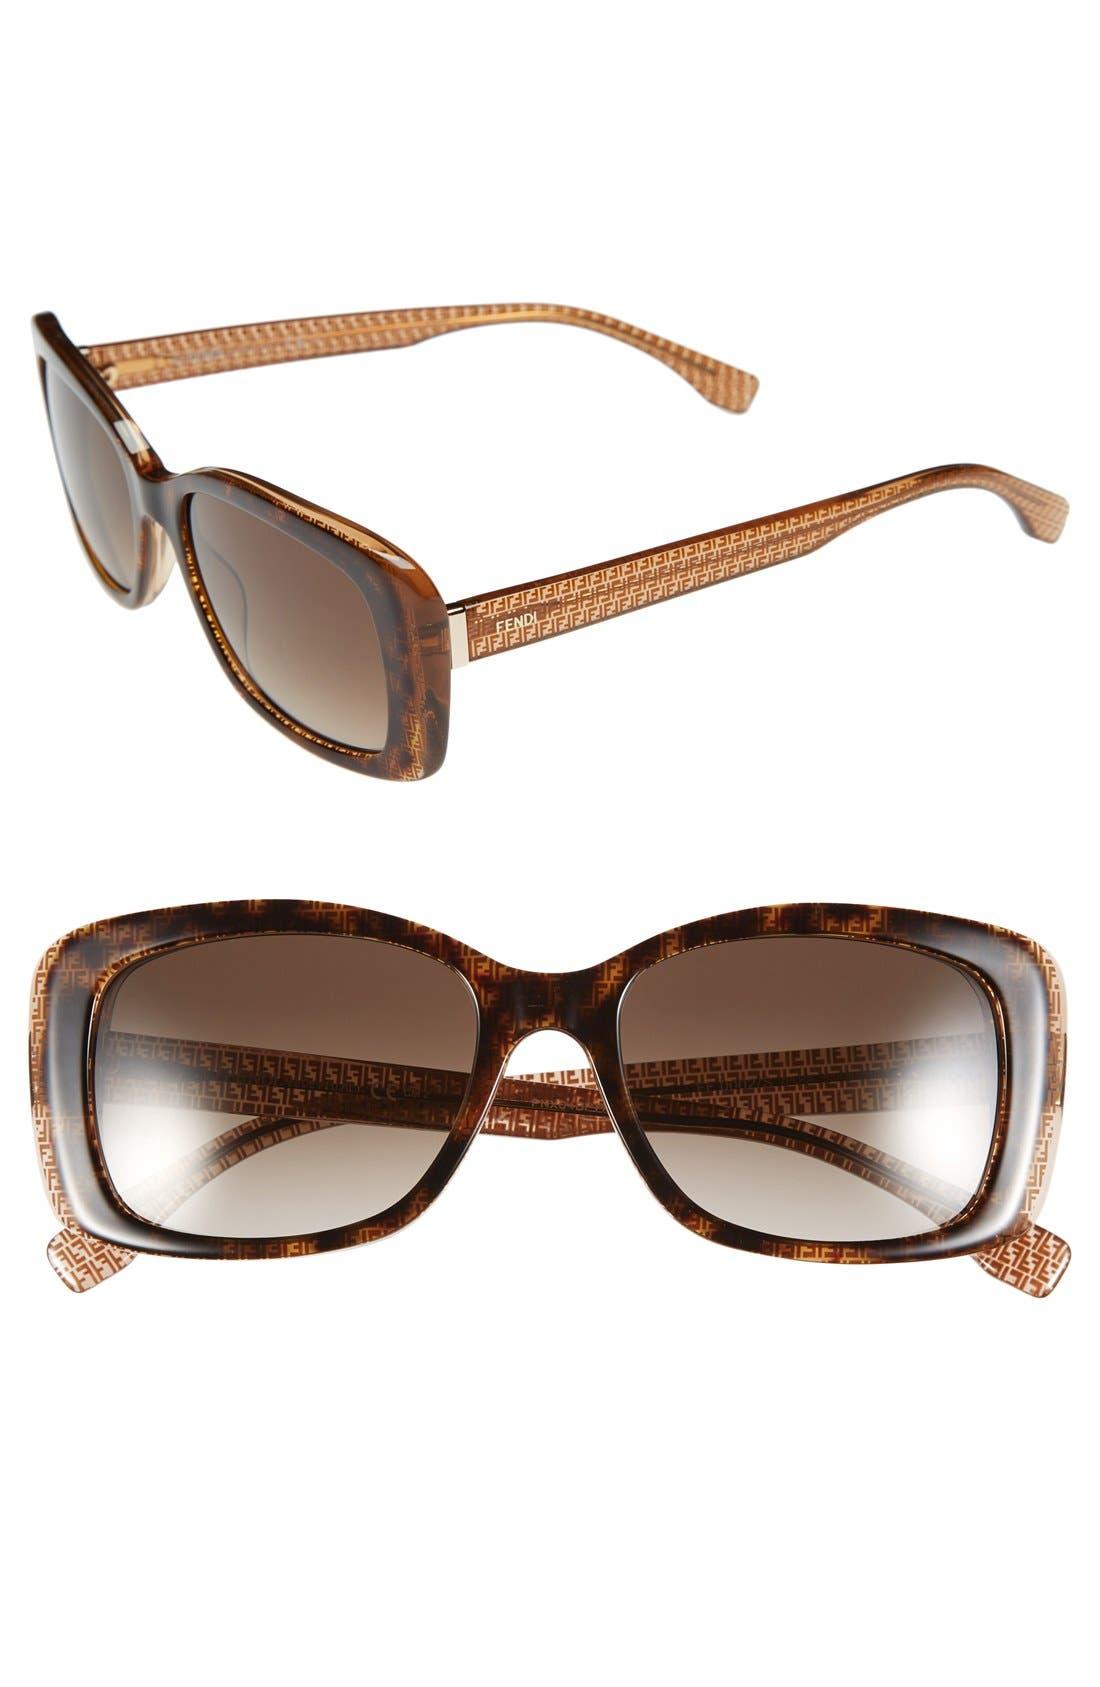 Alternate Image 1 Selected - Fendi 53mm Retro Sunglasses